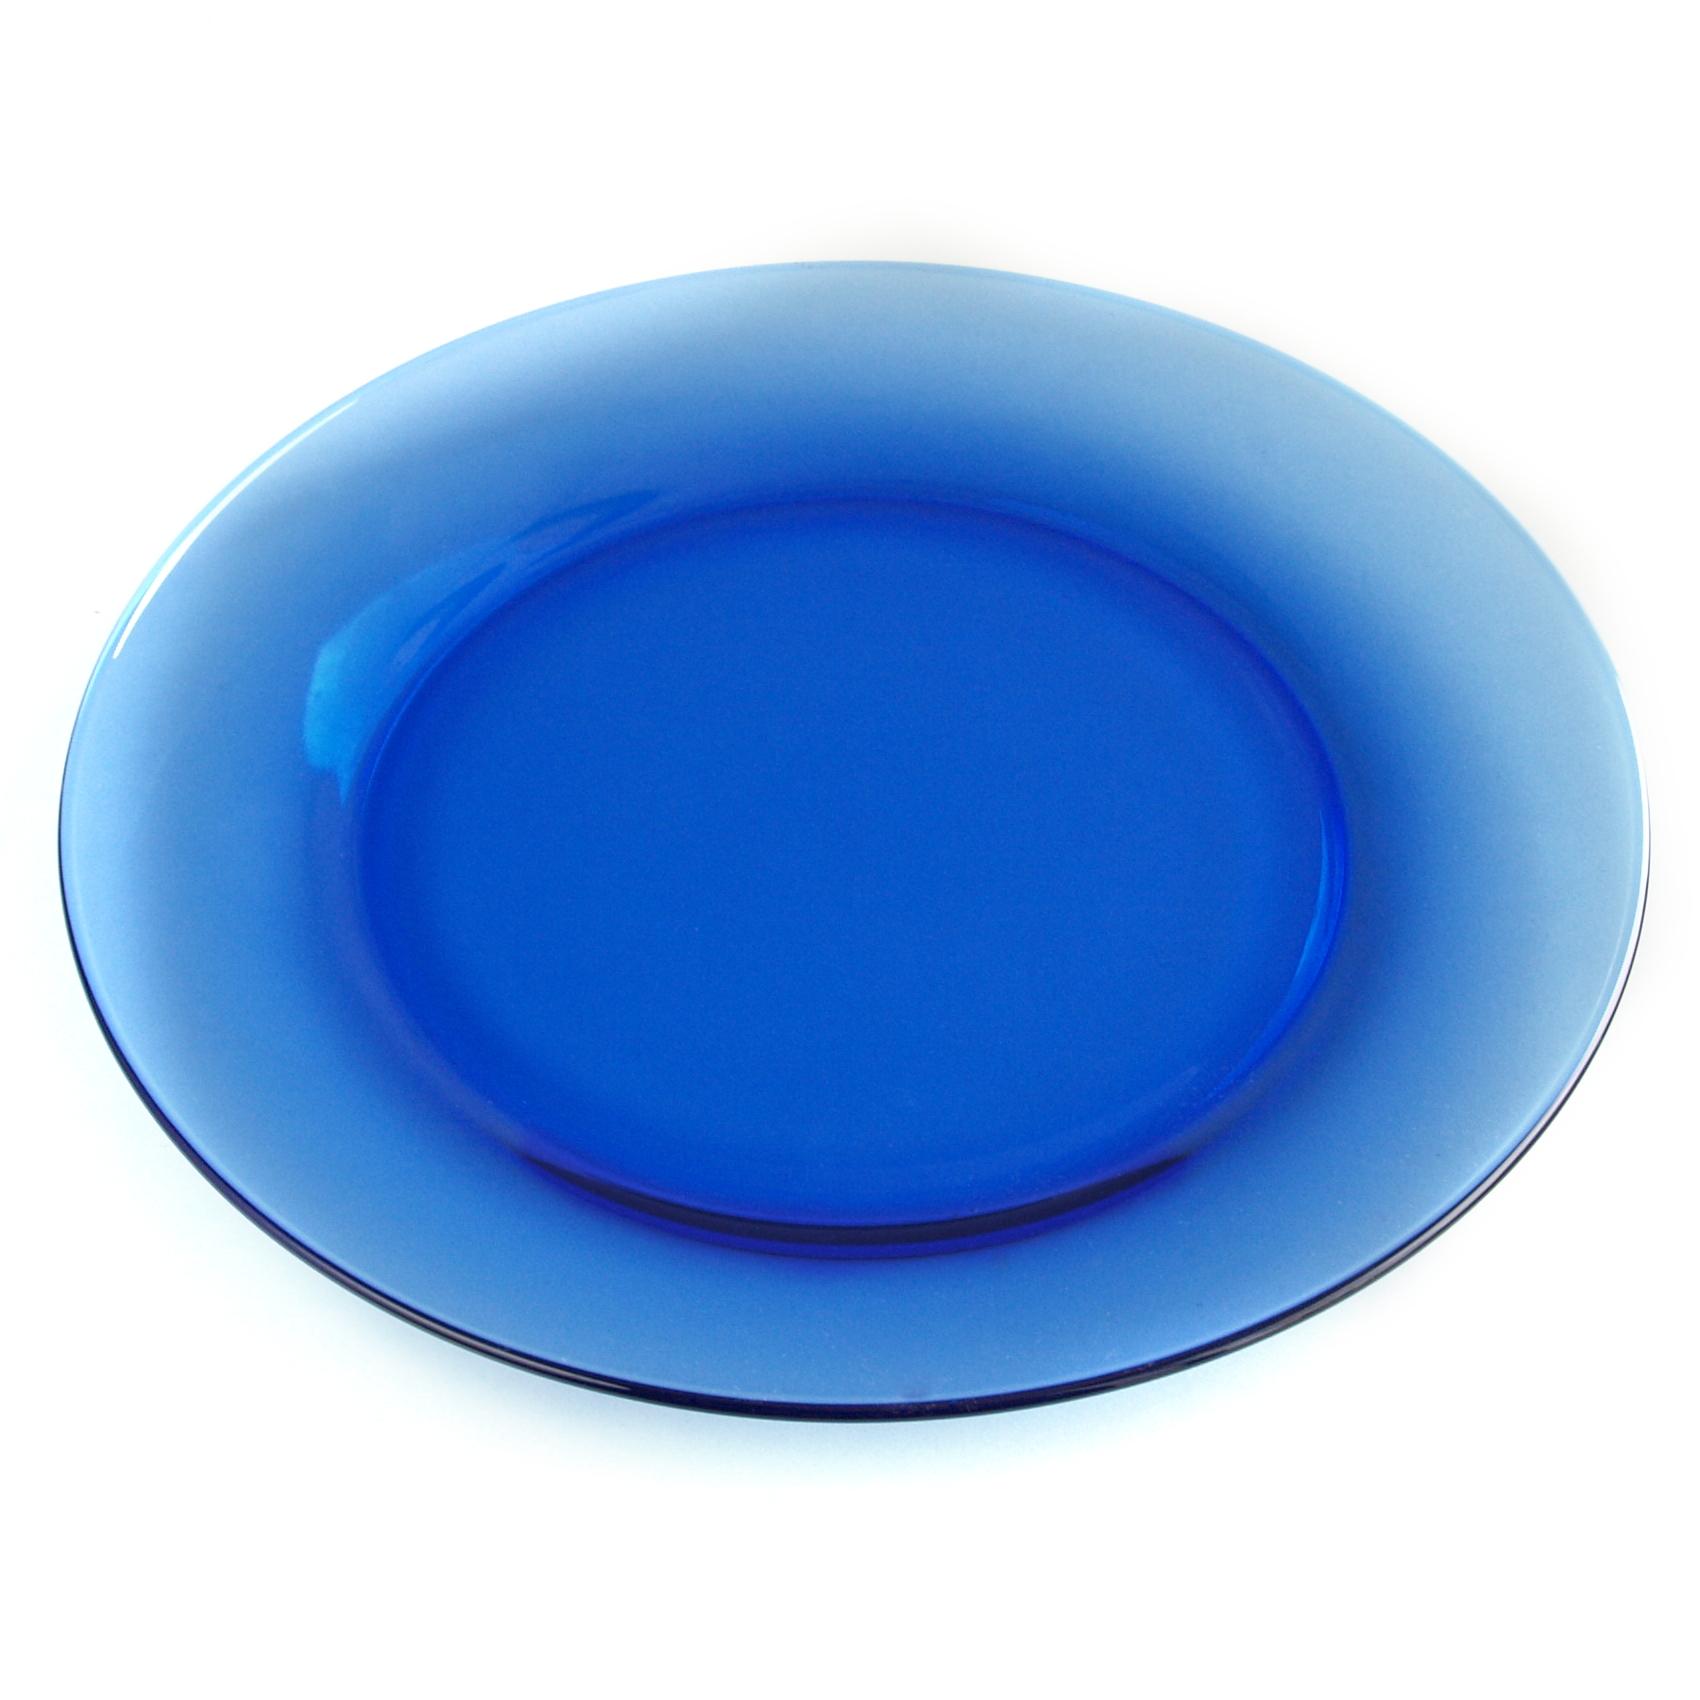 Anchor Hocking Cobalt Blue Glass Round 10 Inch Dinner Plate - Slight IR